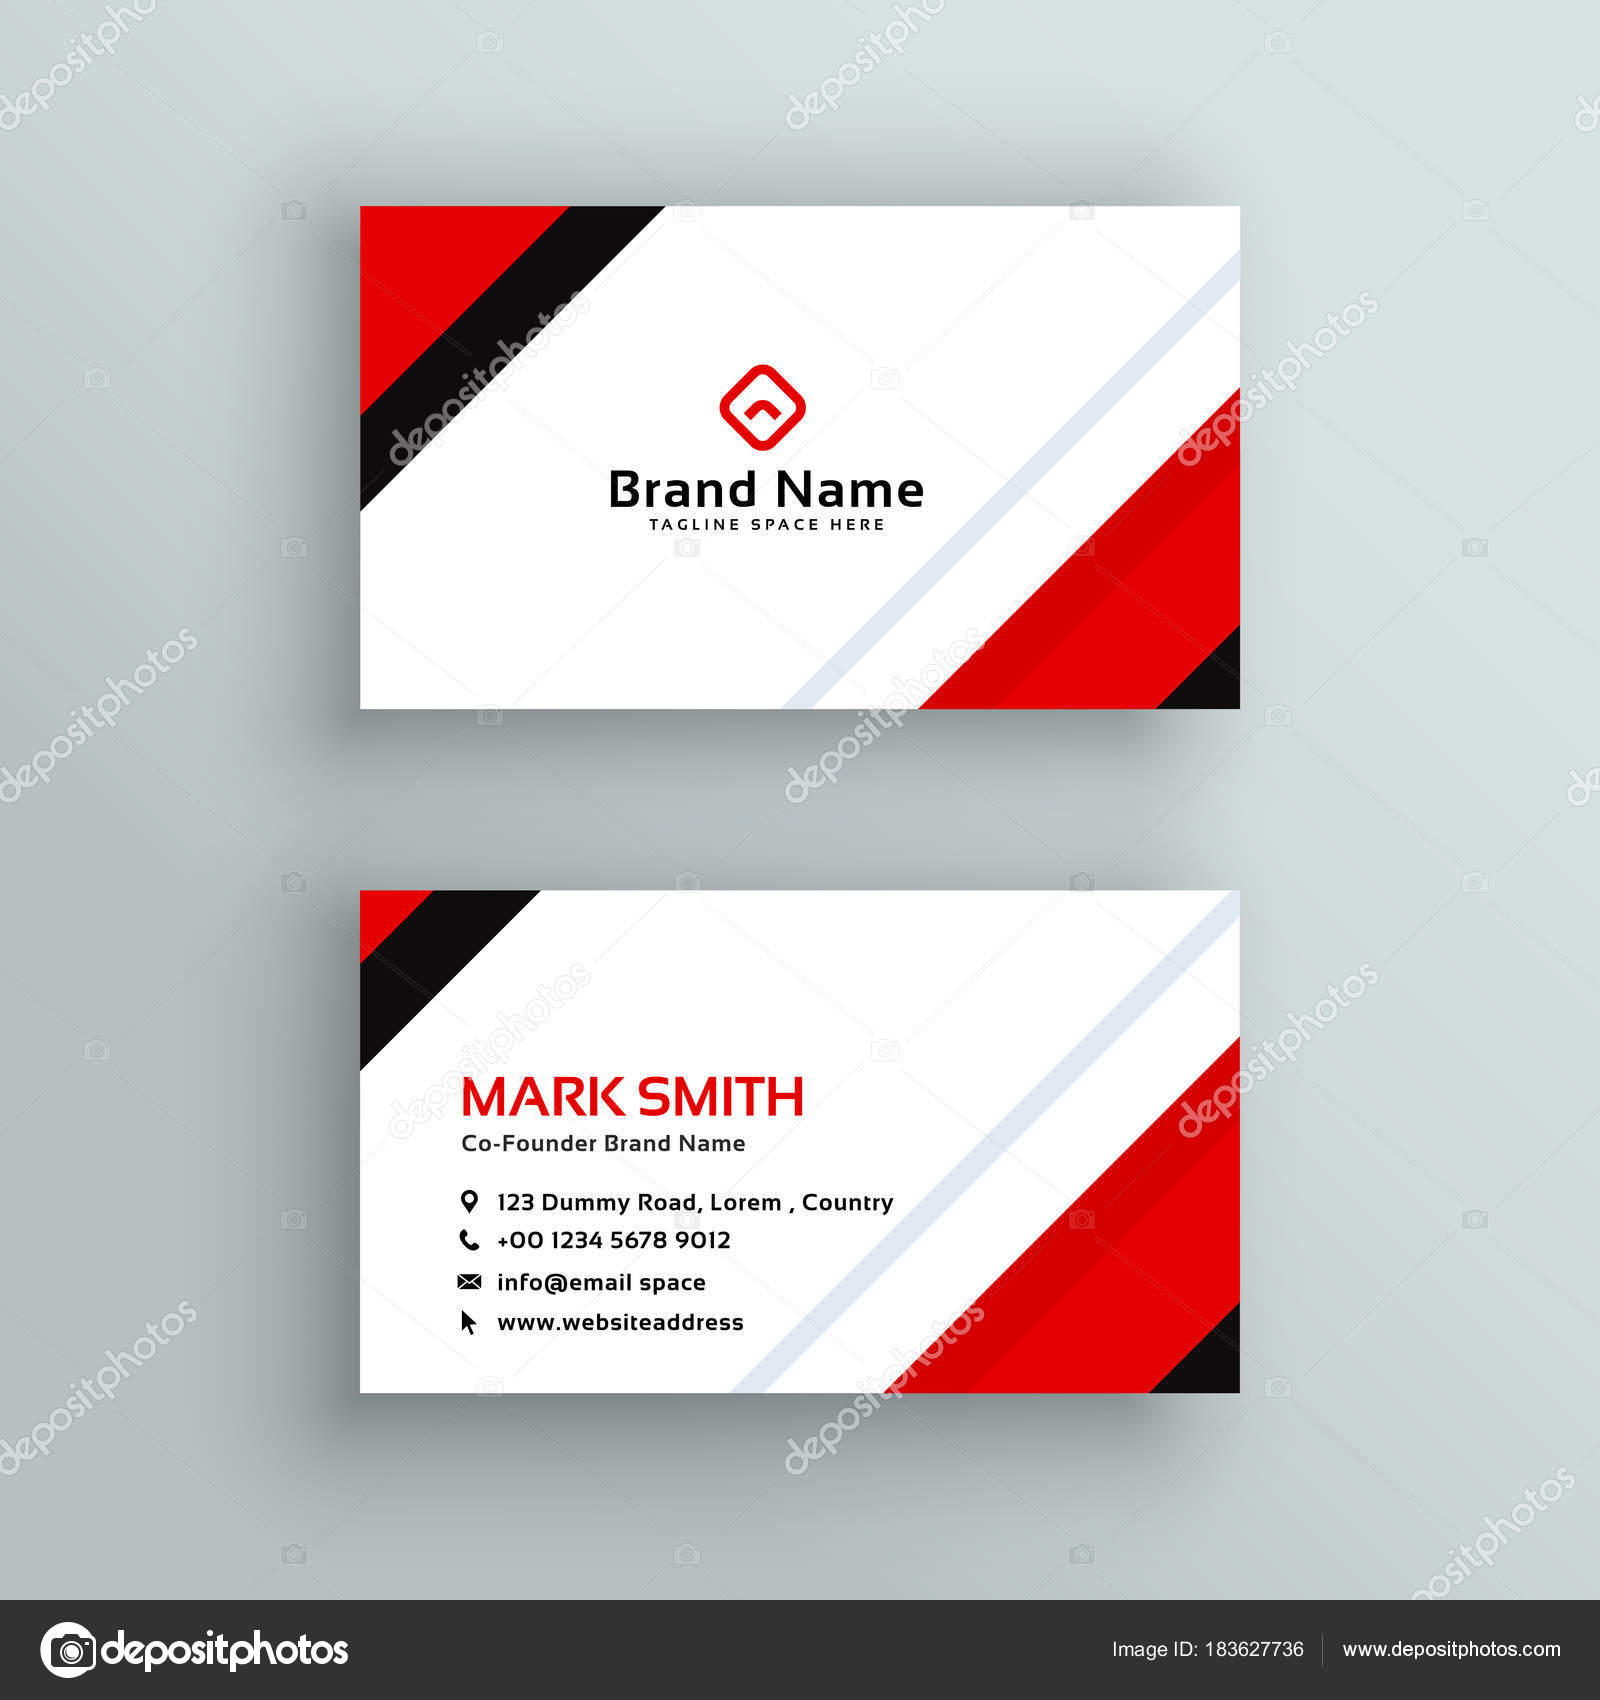 Modern professional red business card design stock vector modern professional red business card design stock vector colourmoves